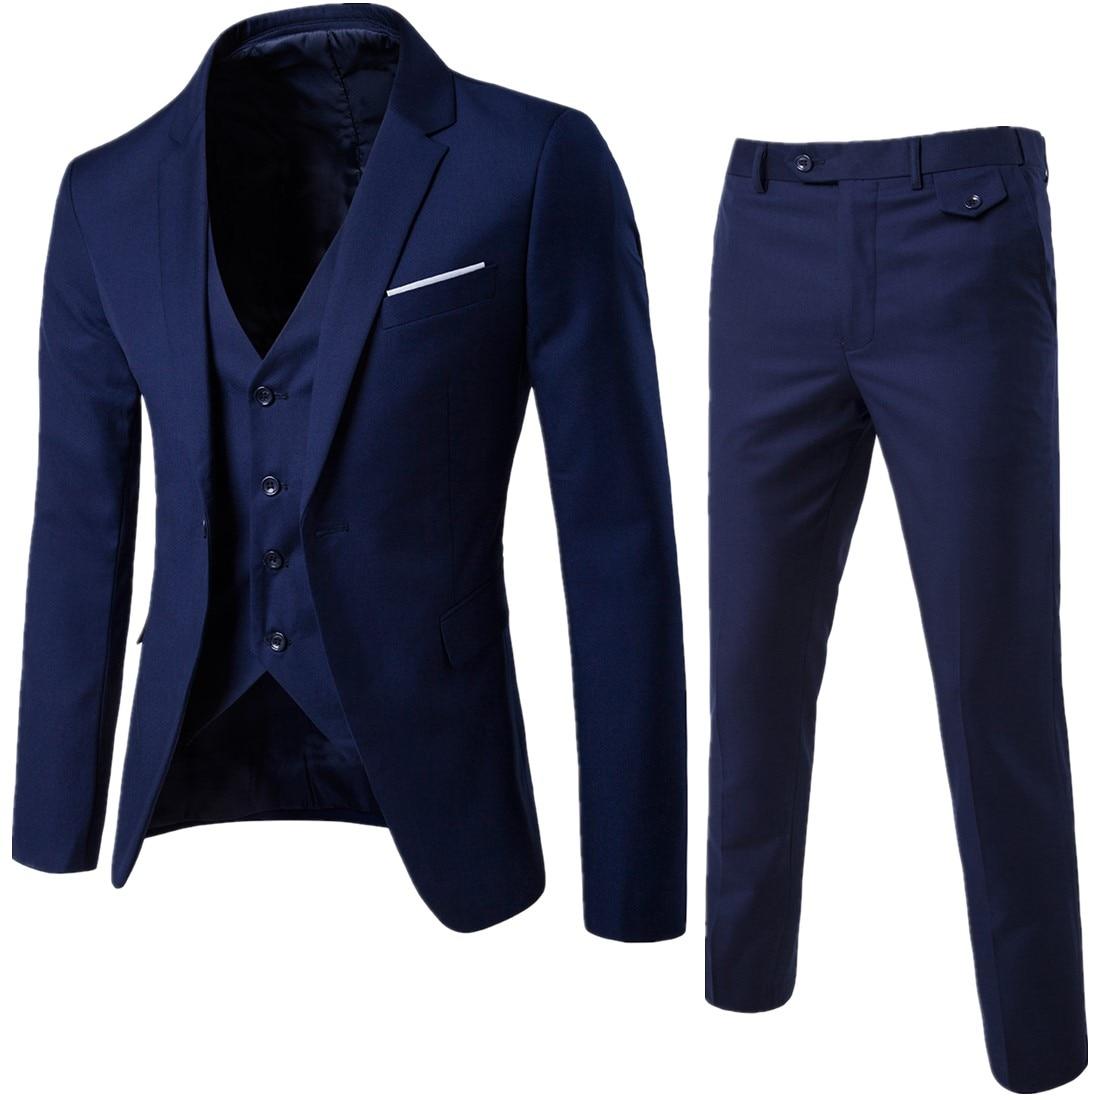 2017 New Plus Size 6xl Mens Suits Wedding Groom Good Quality Casual Male Suits 3 Peiece (jacket+pant+vest) YF-20